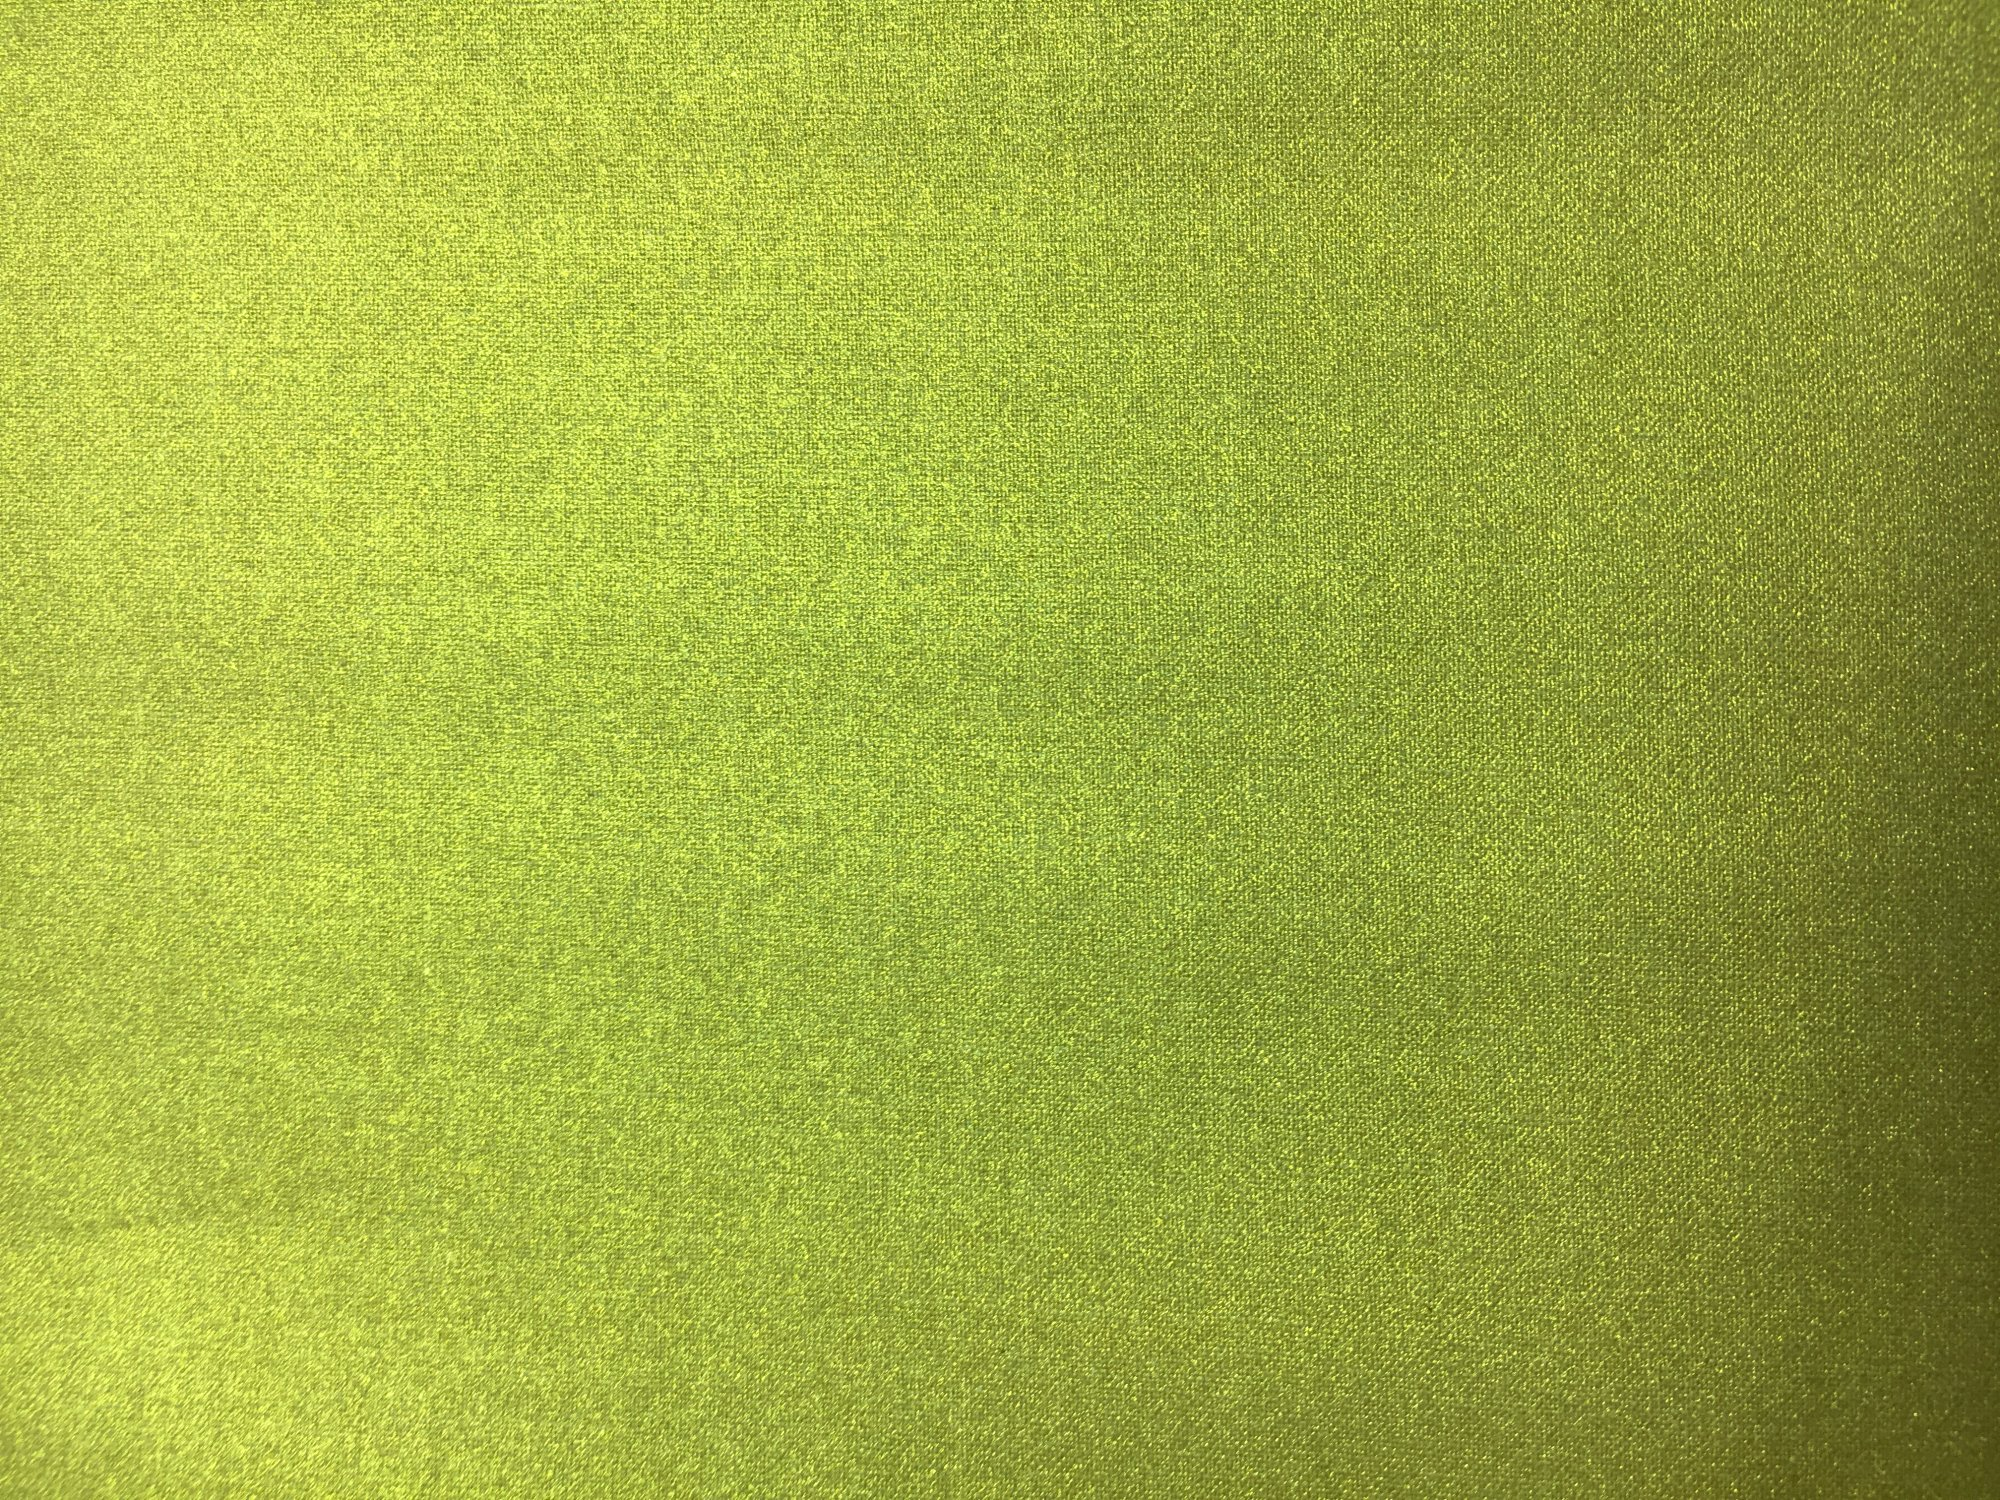 Stof; Solid Metallic cotton fabric